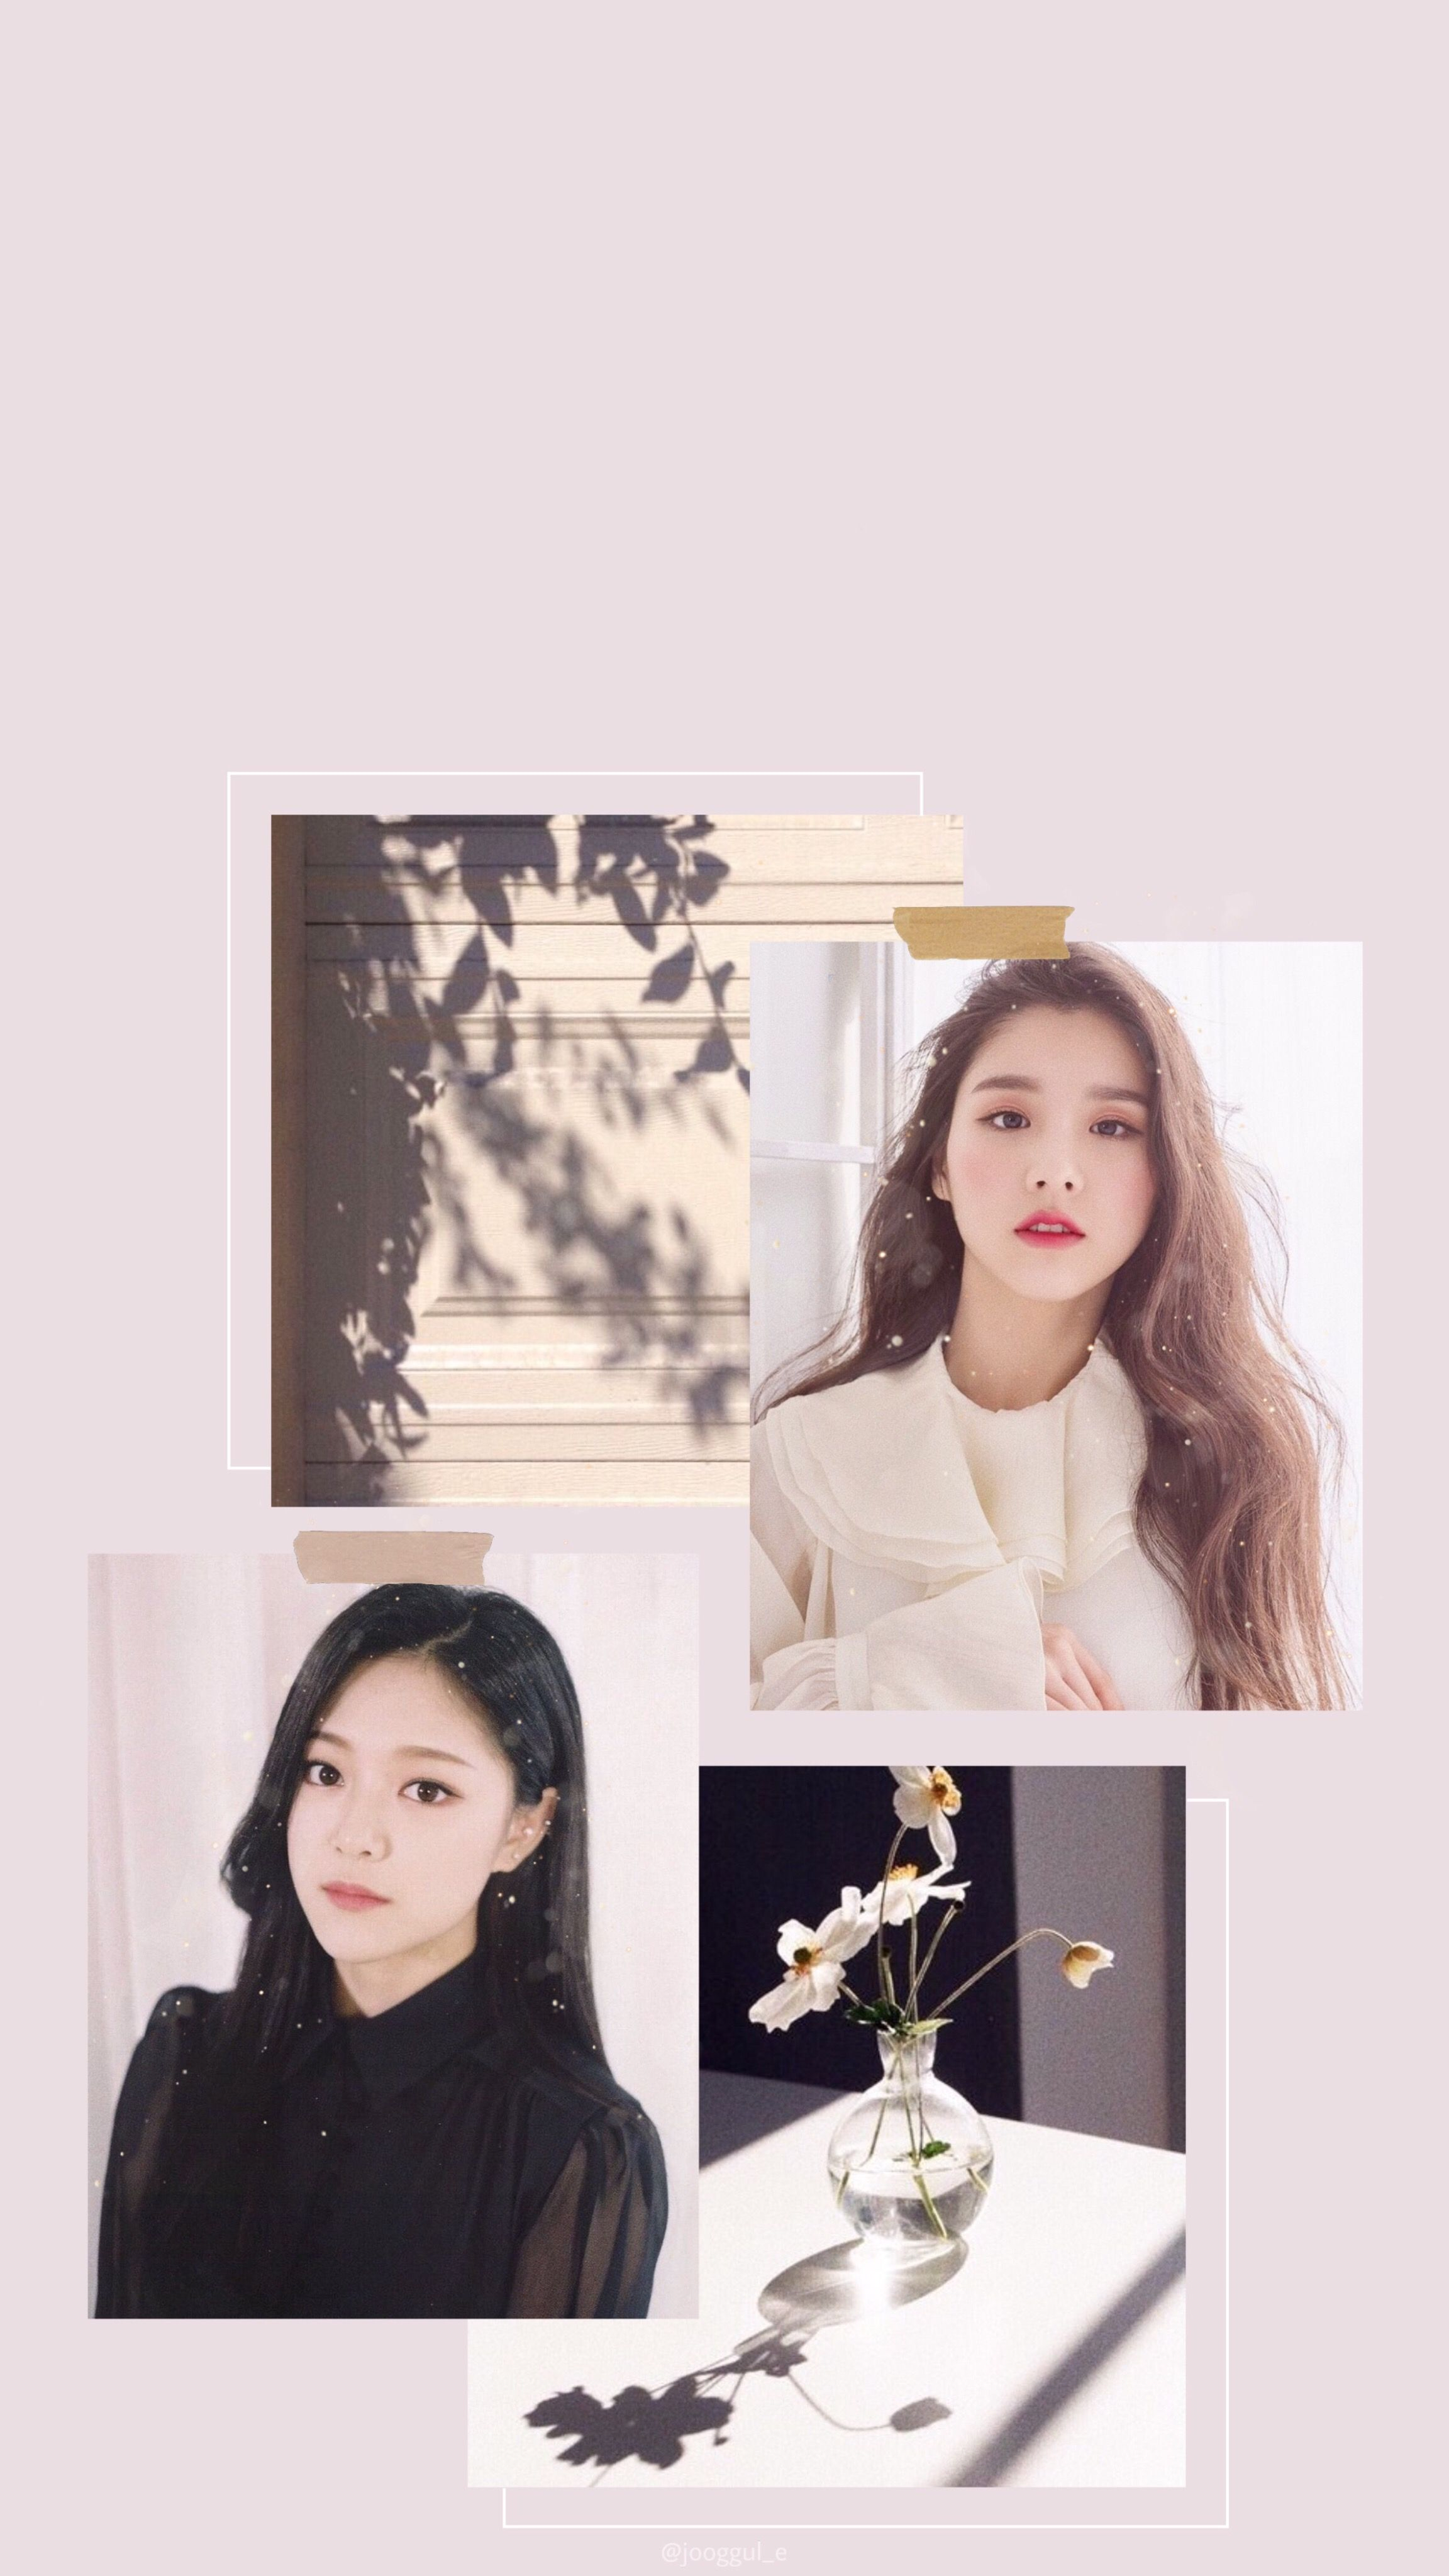 Heejin Wallpaper Fotografi Kreatif Gadis Lucu Gambar